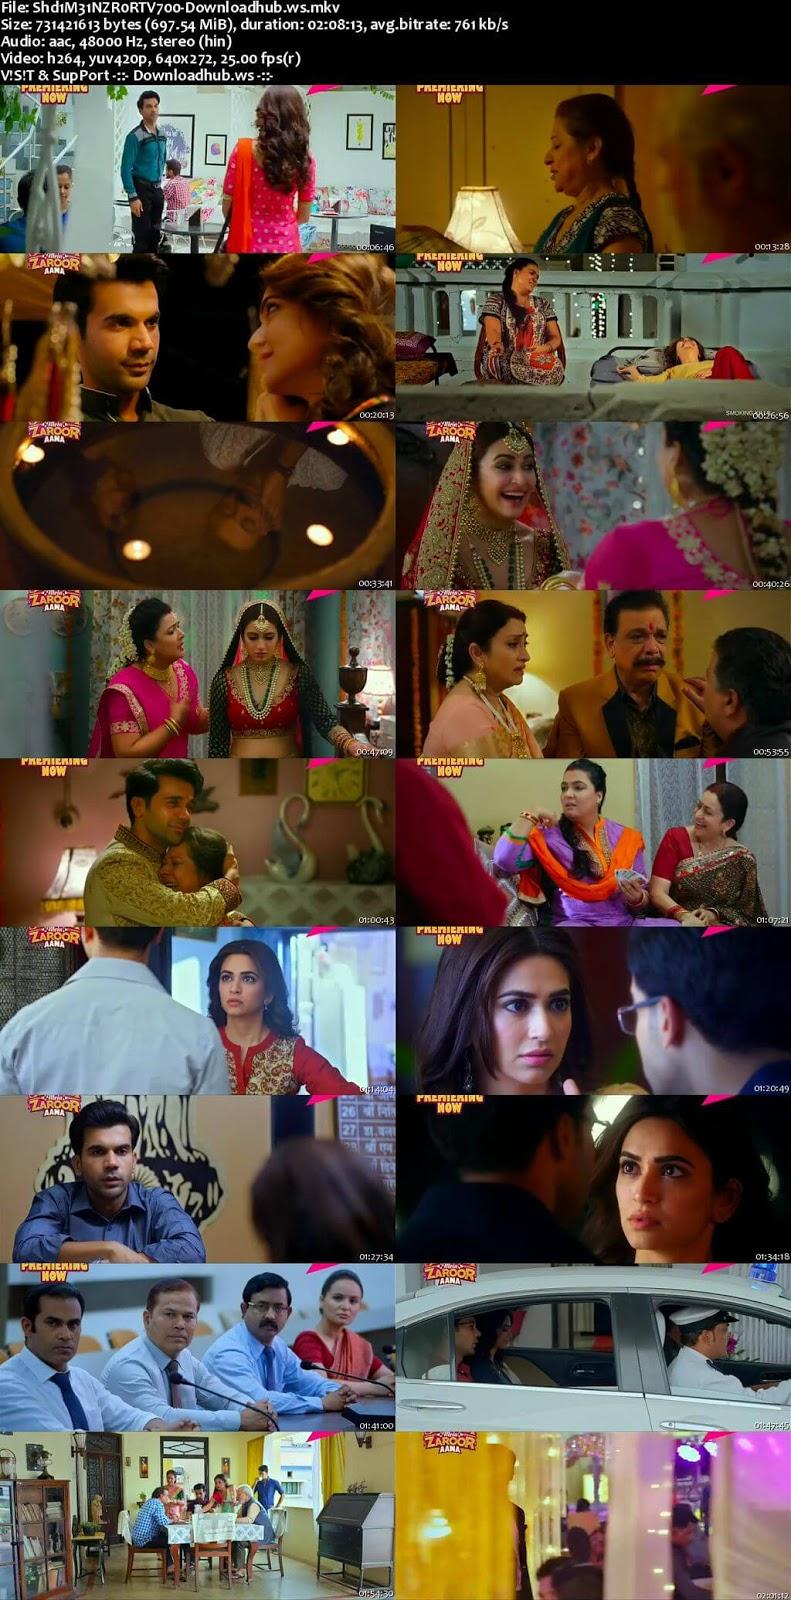 Shaadi Mein Zaroor Aana 2017 Hindi 700MB HDTV